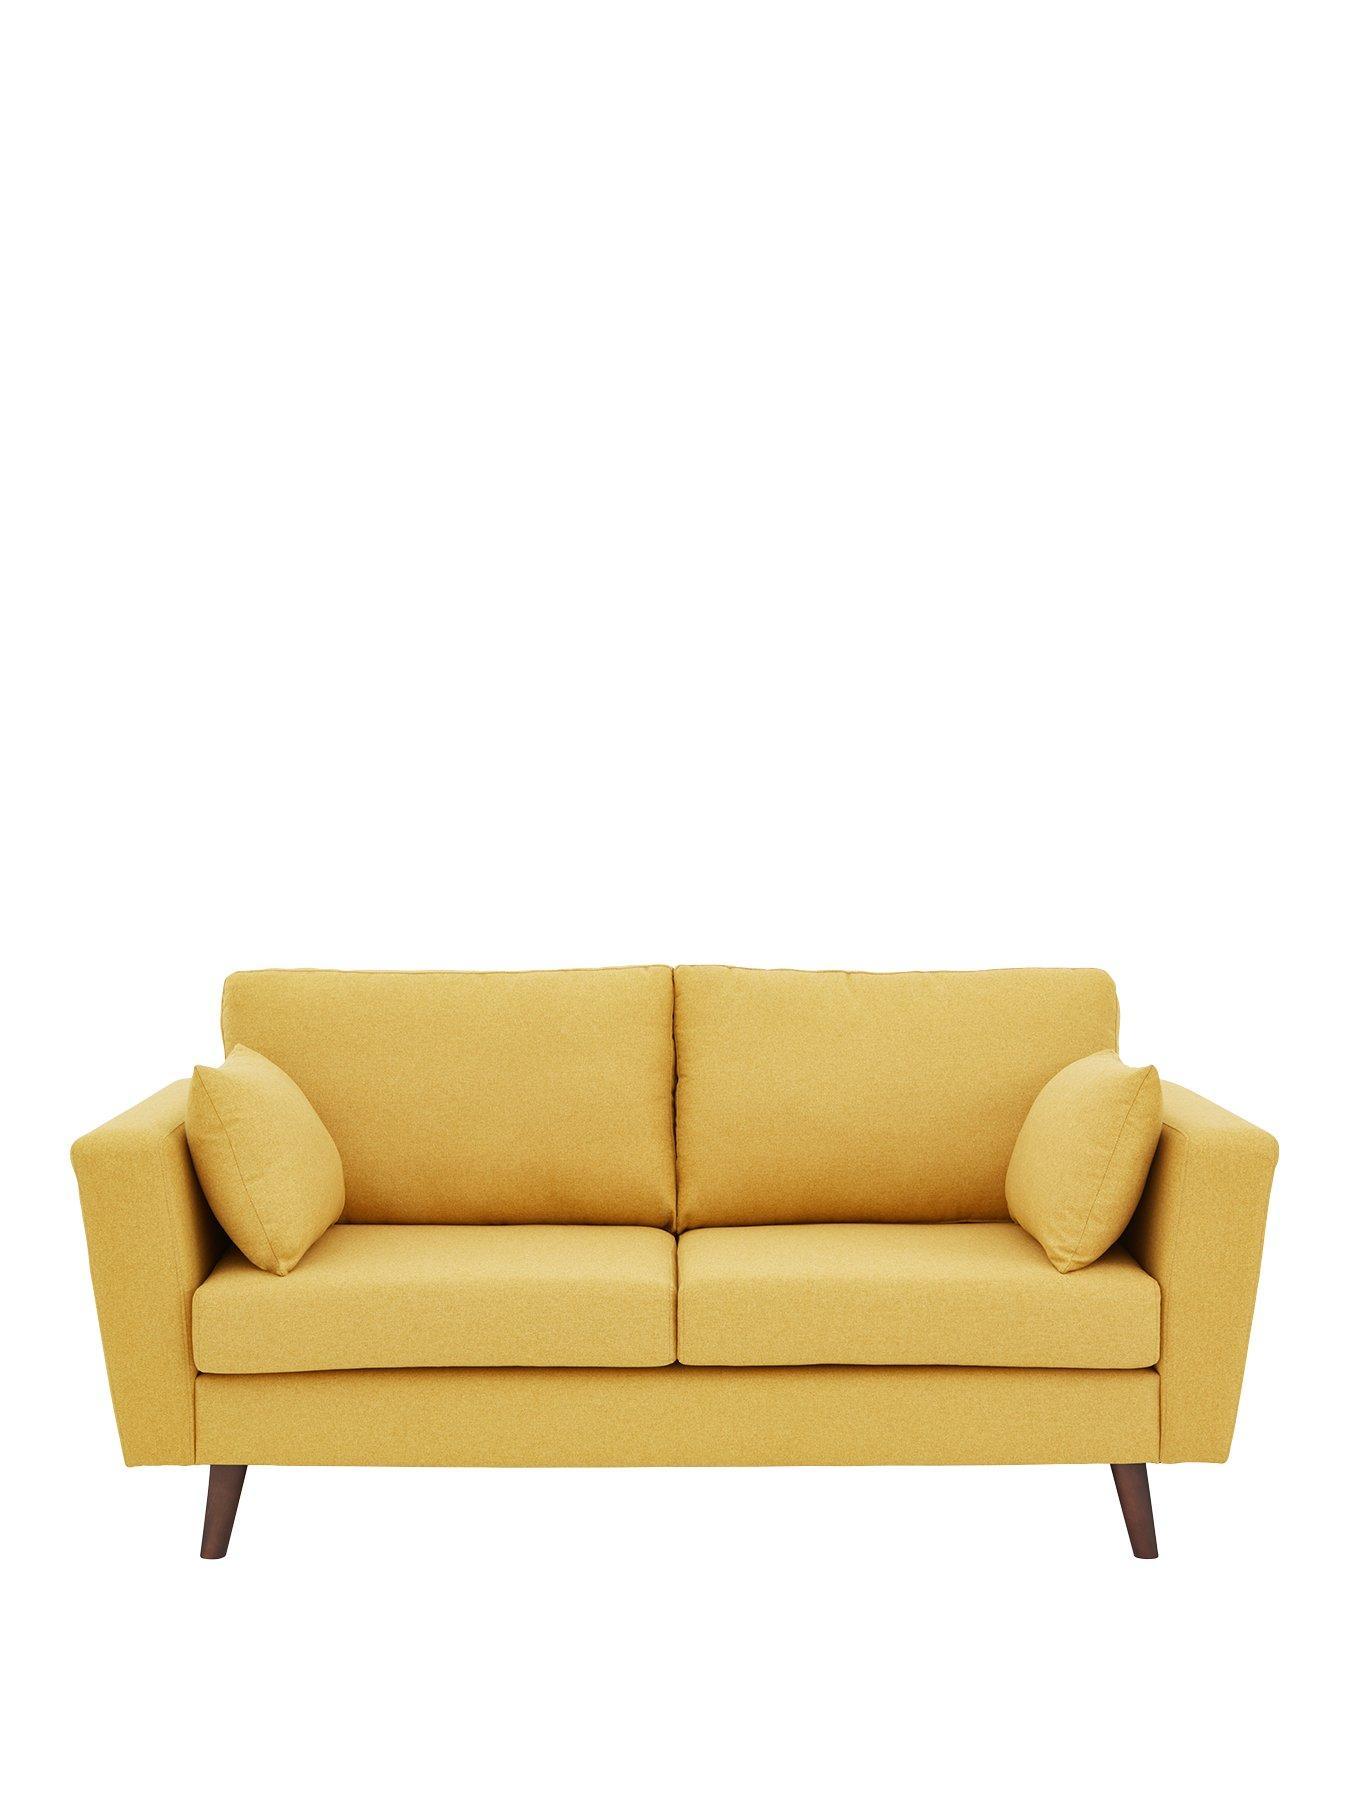 Beau Ideal Home Porter Fabric 3 Seater Sofa   Mustard